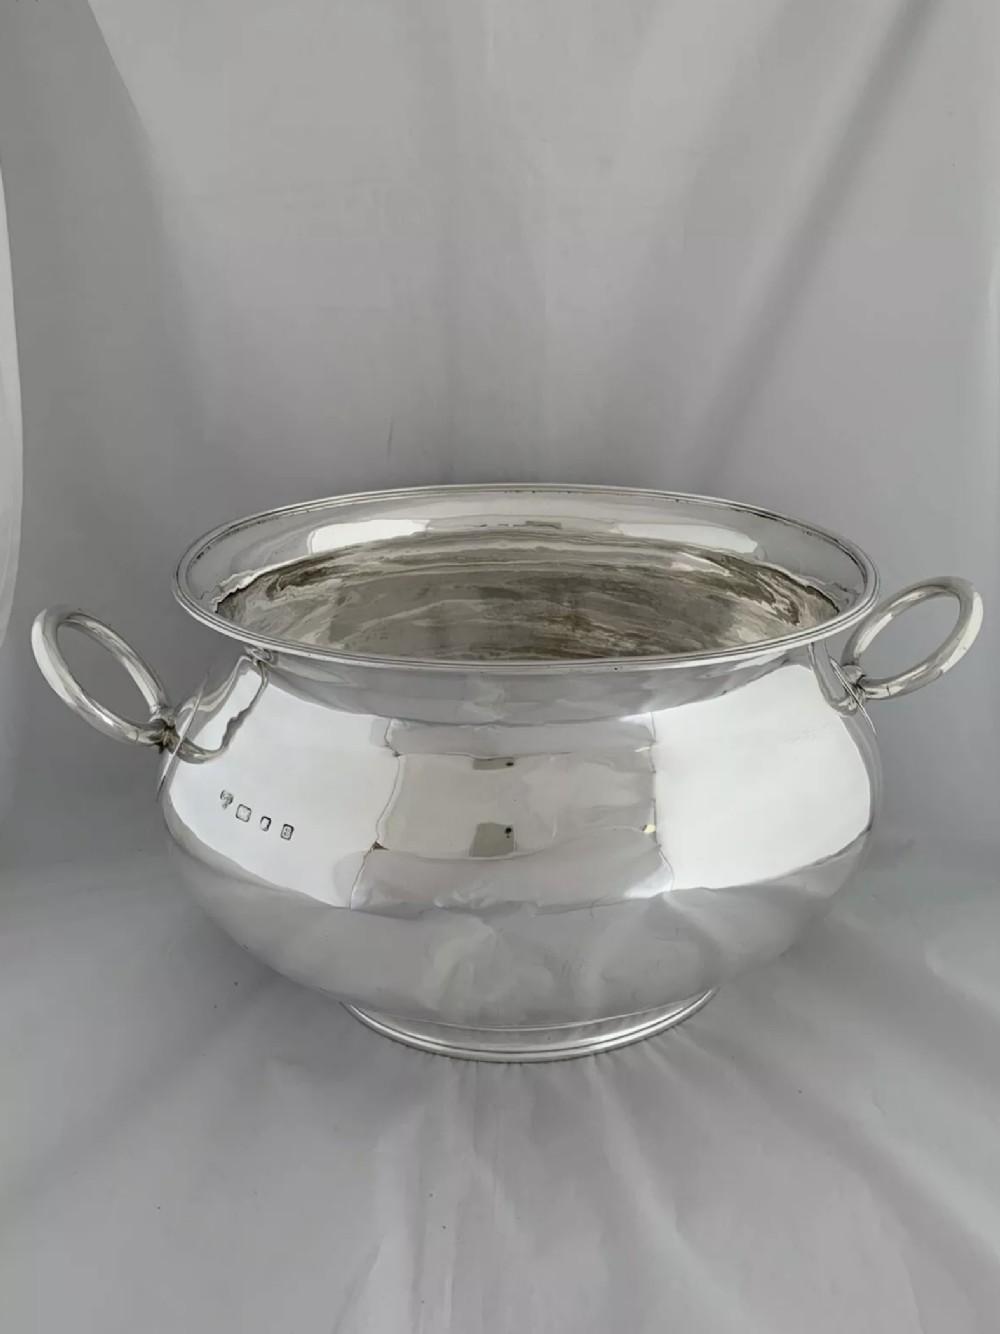 huge 18 kg antique silver tureen or punch bowl 1937 london charles boyton son